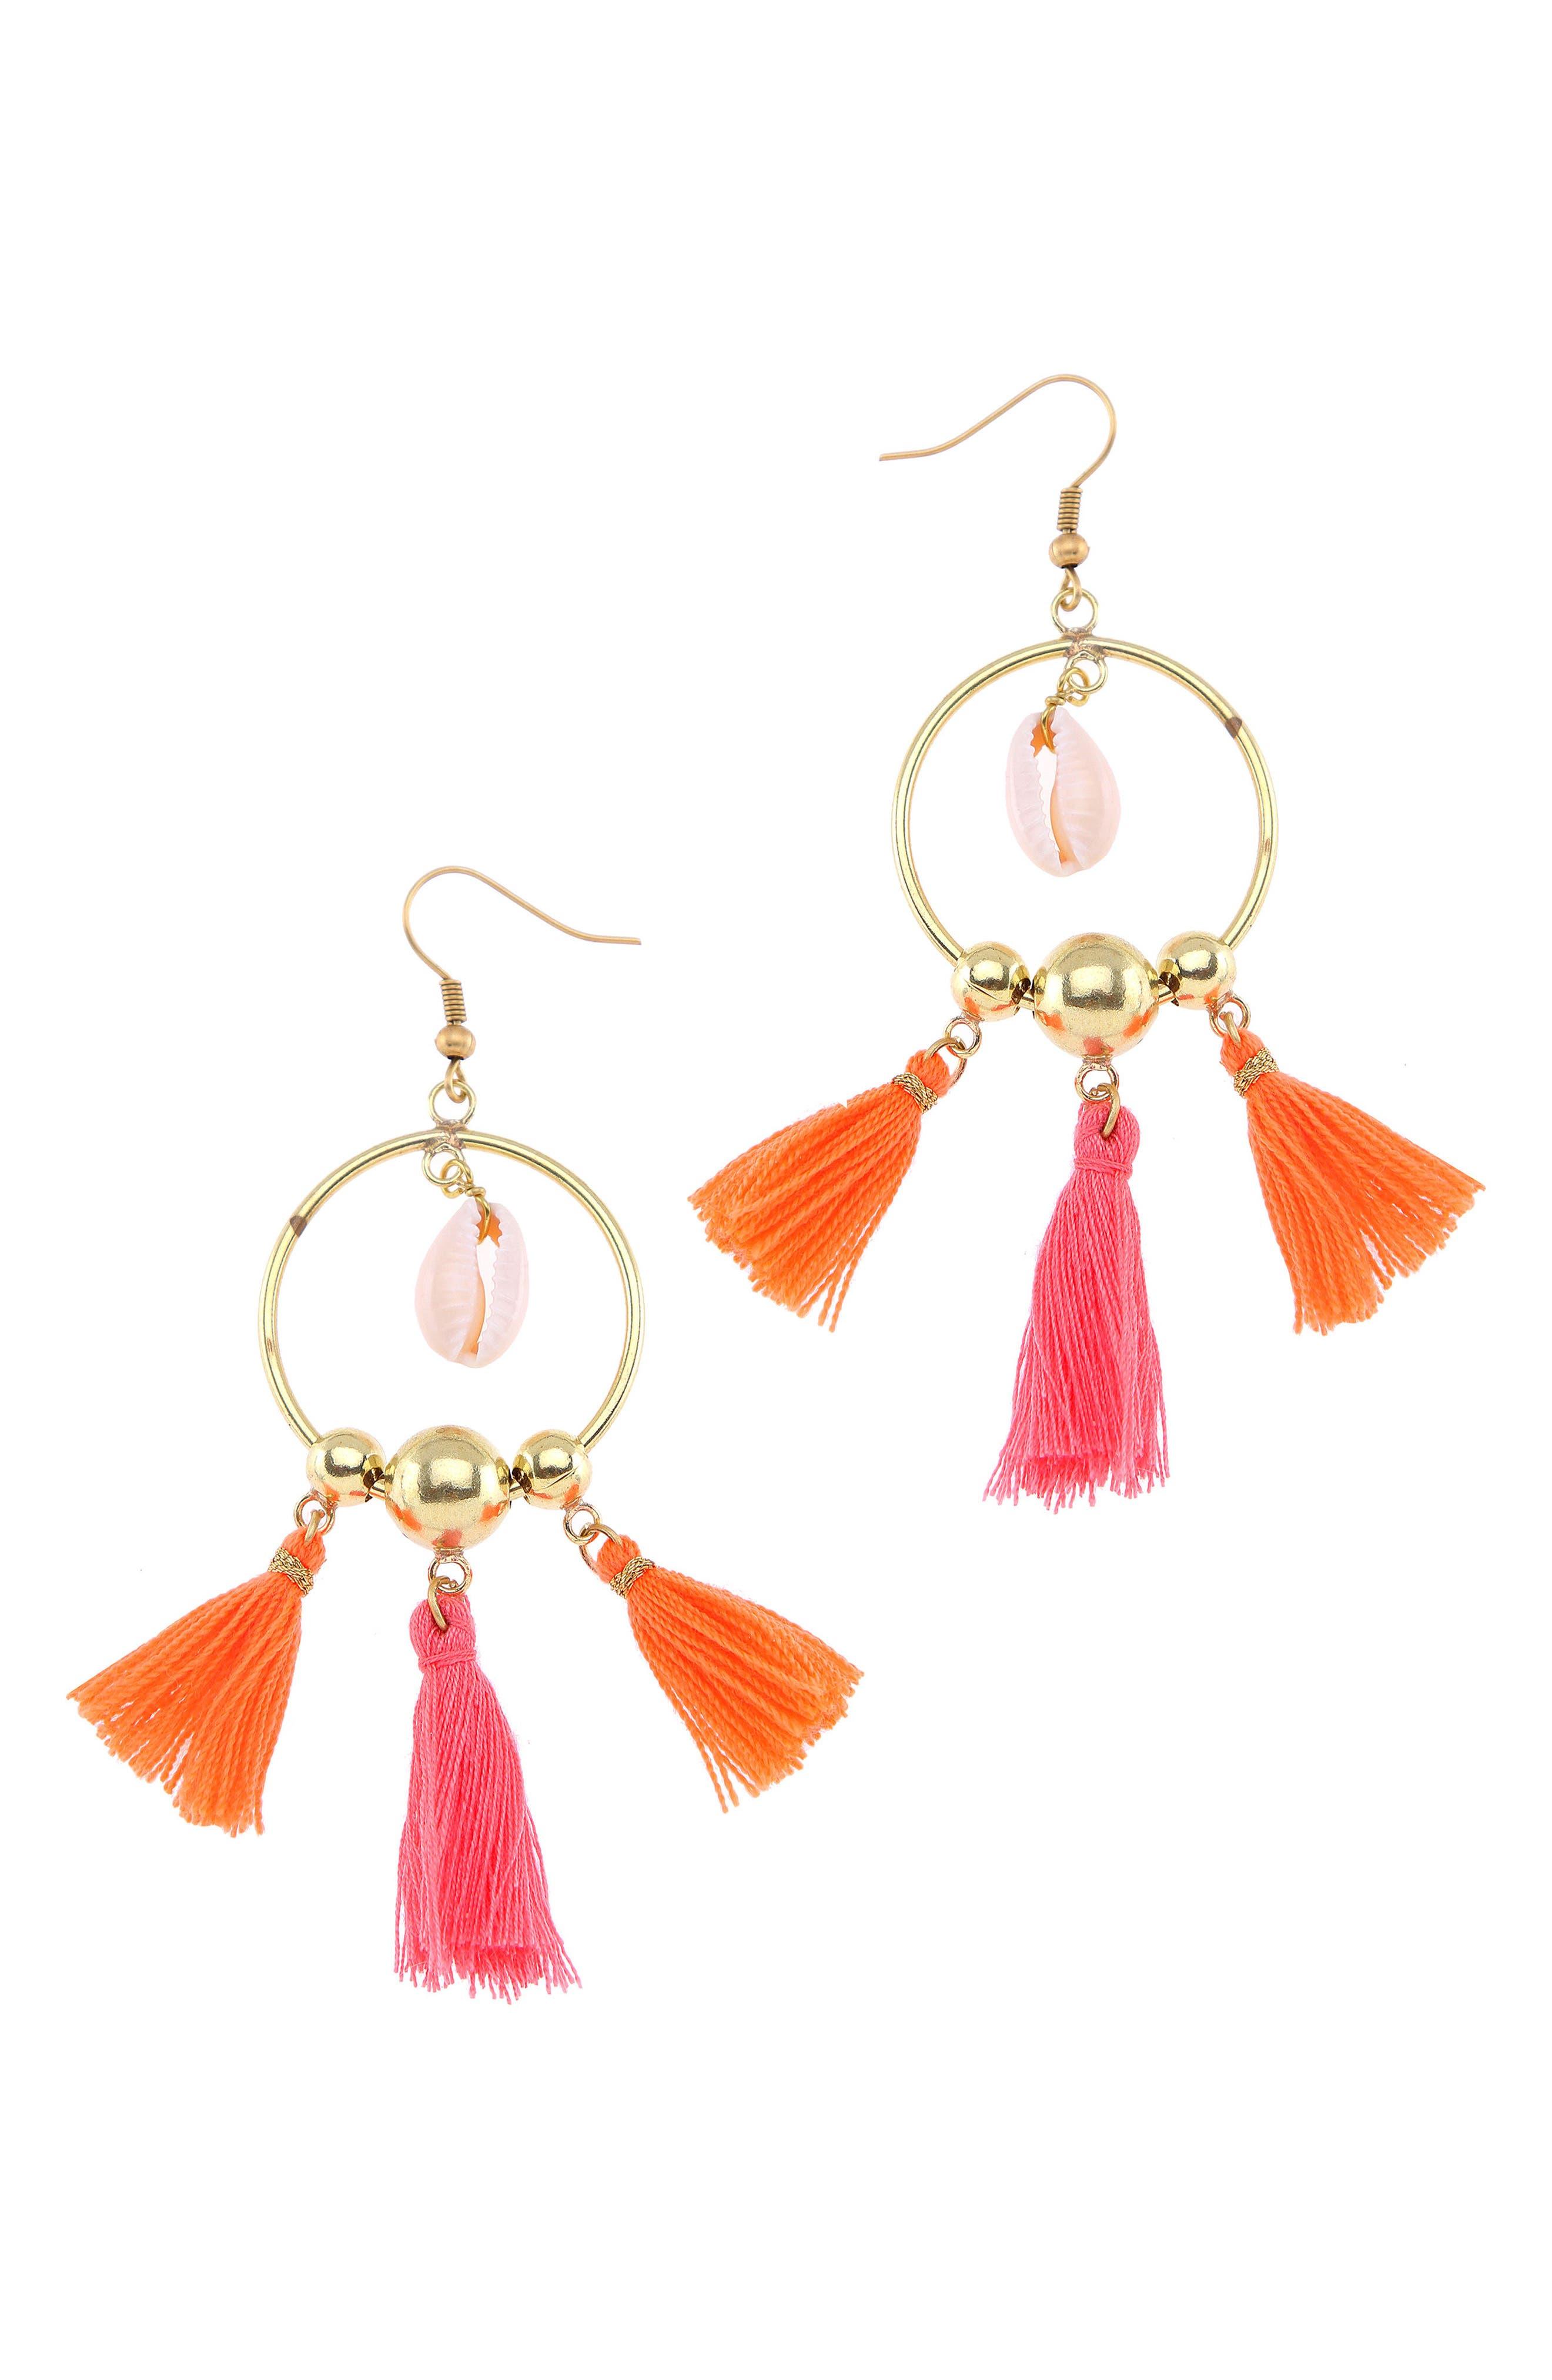 Tiny Tassel Hoop Earrings,                             Main thumbnail 1, color,                             800